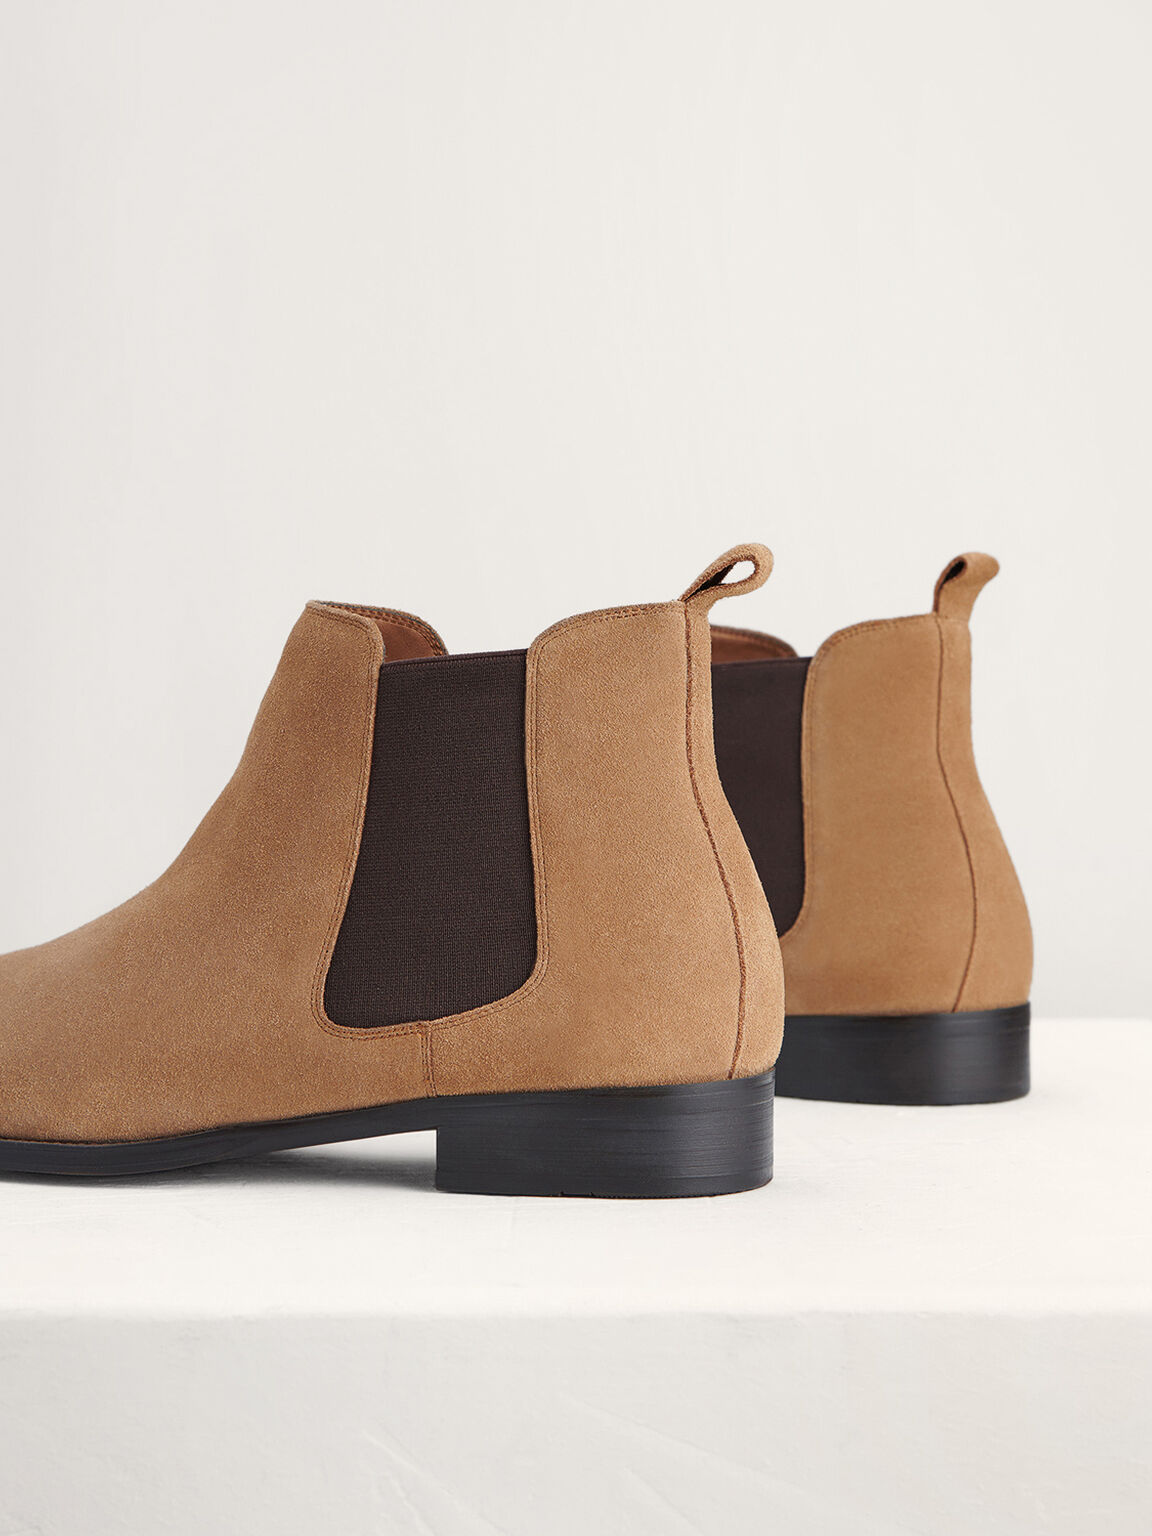 Suede Chelsea Boots, Camel, hi-res